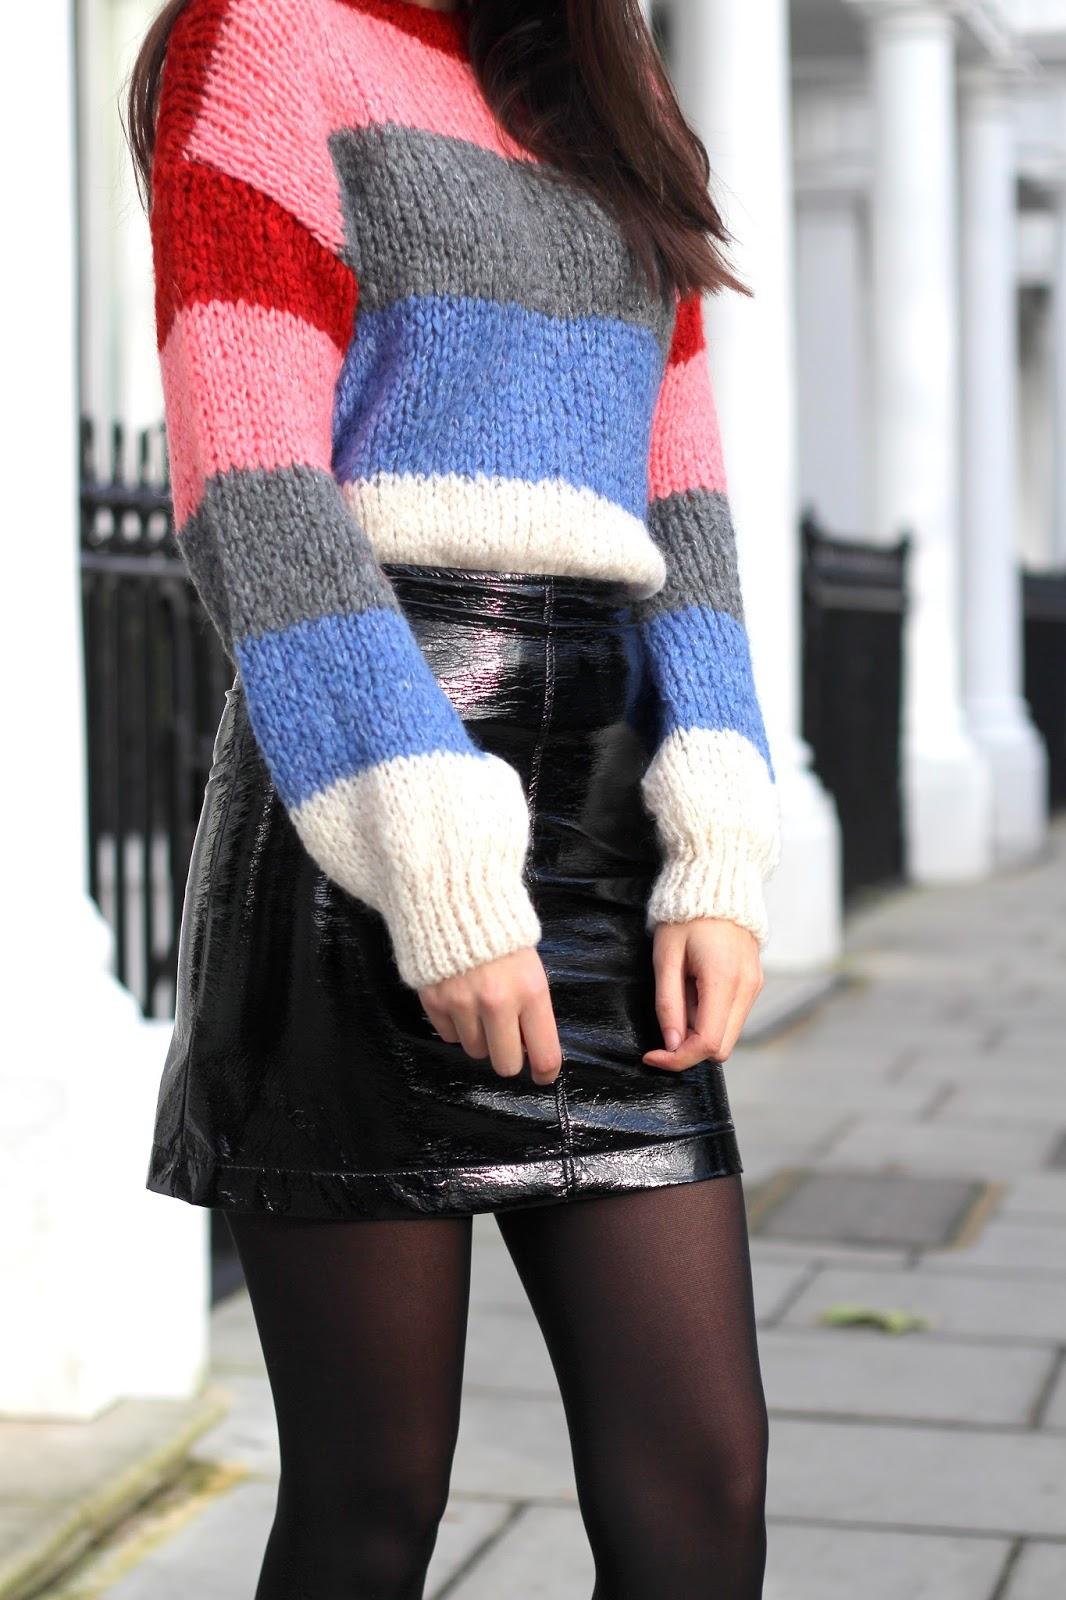 peexo street style london blog